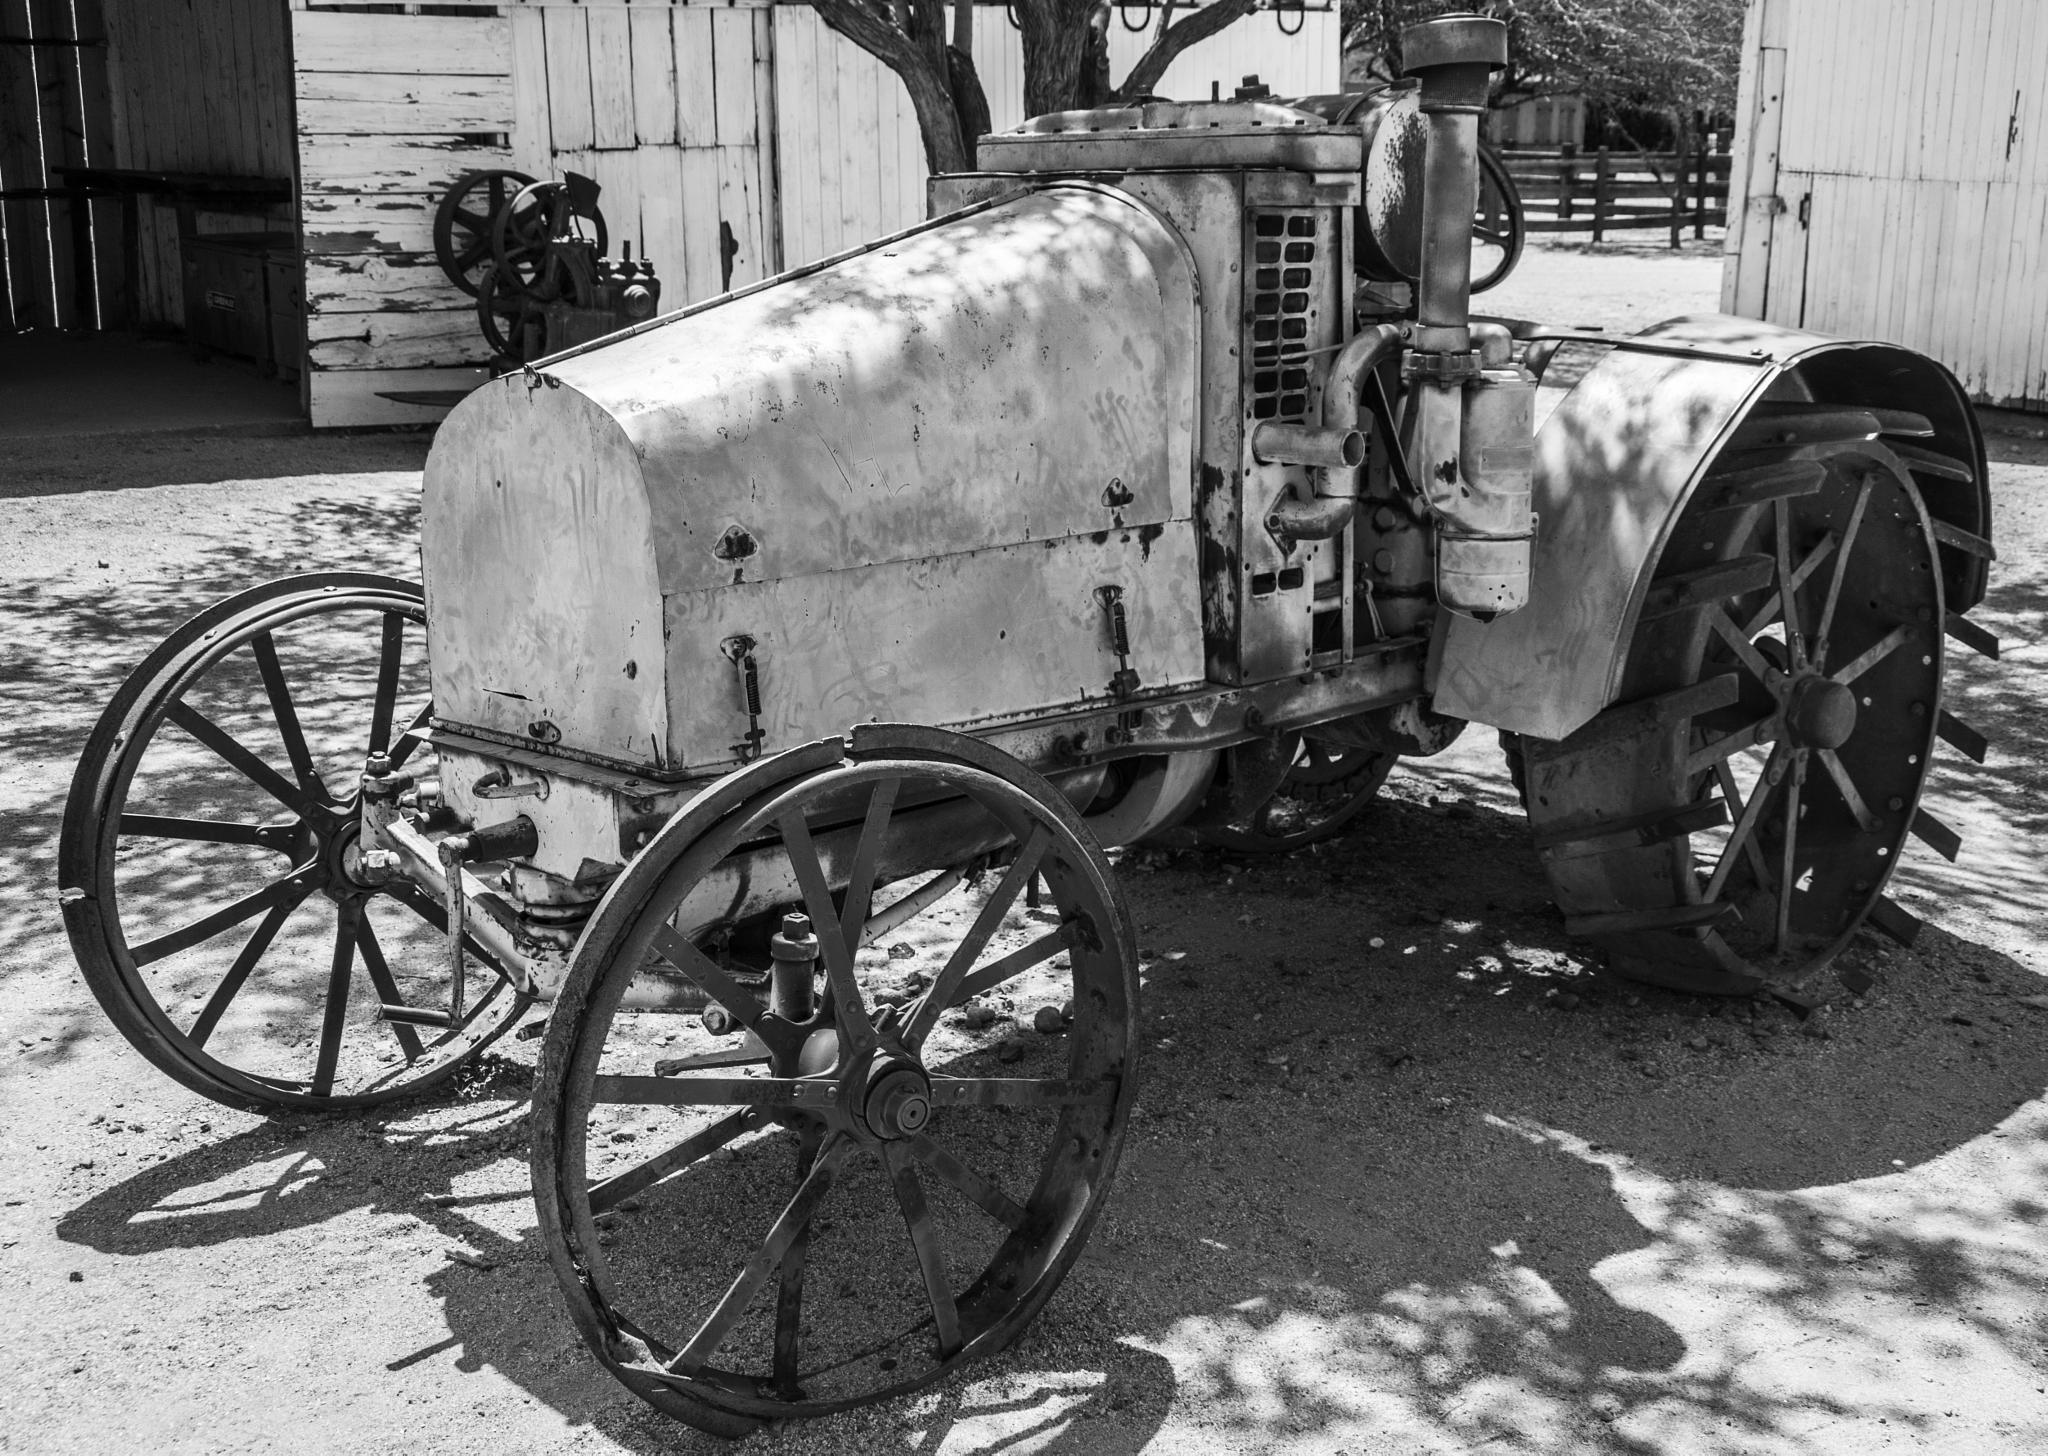 Old Tractor 4 by Daniel Hanson